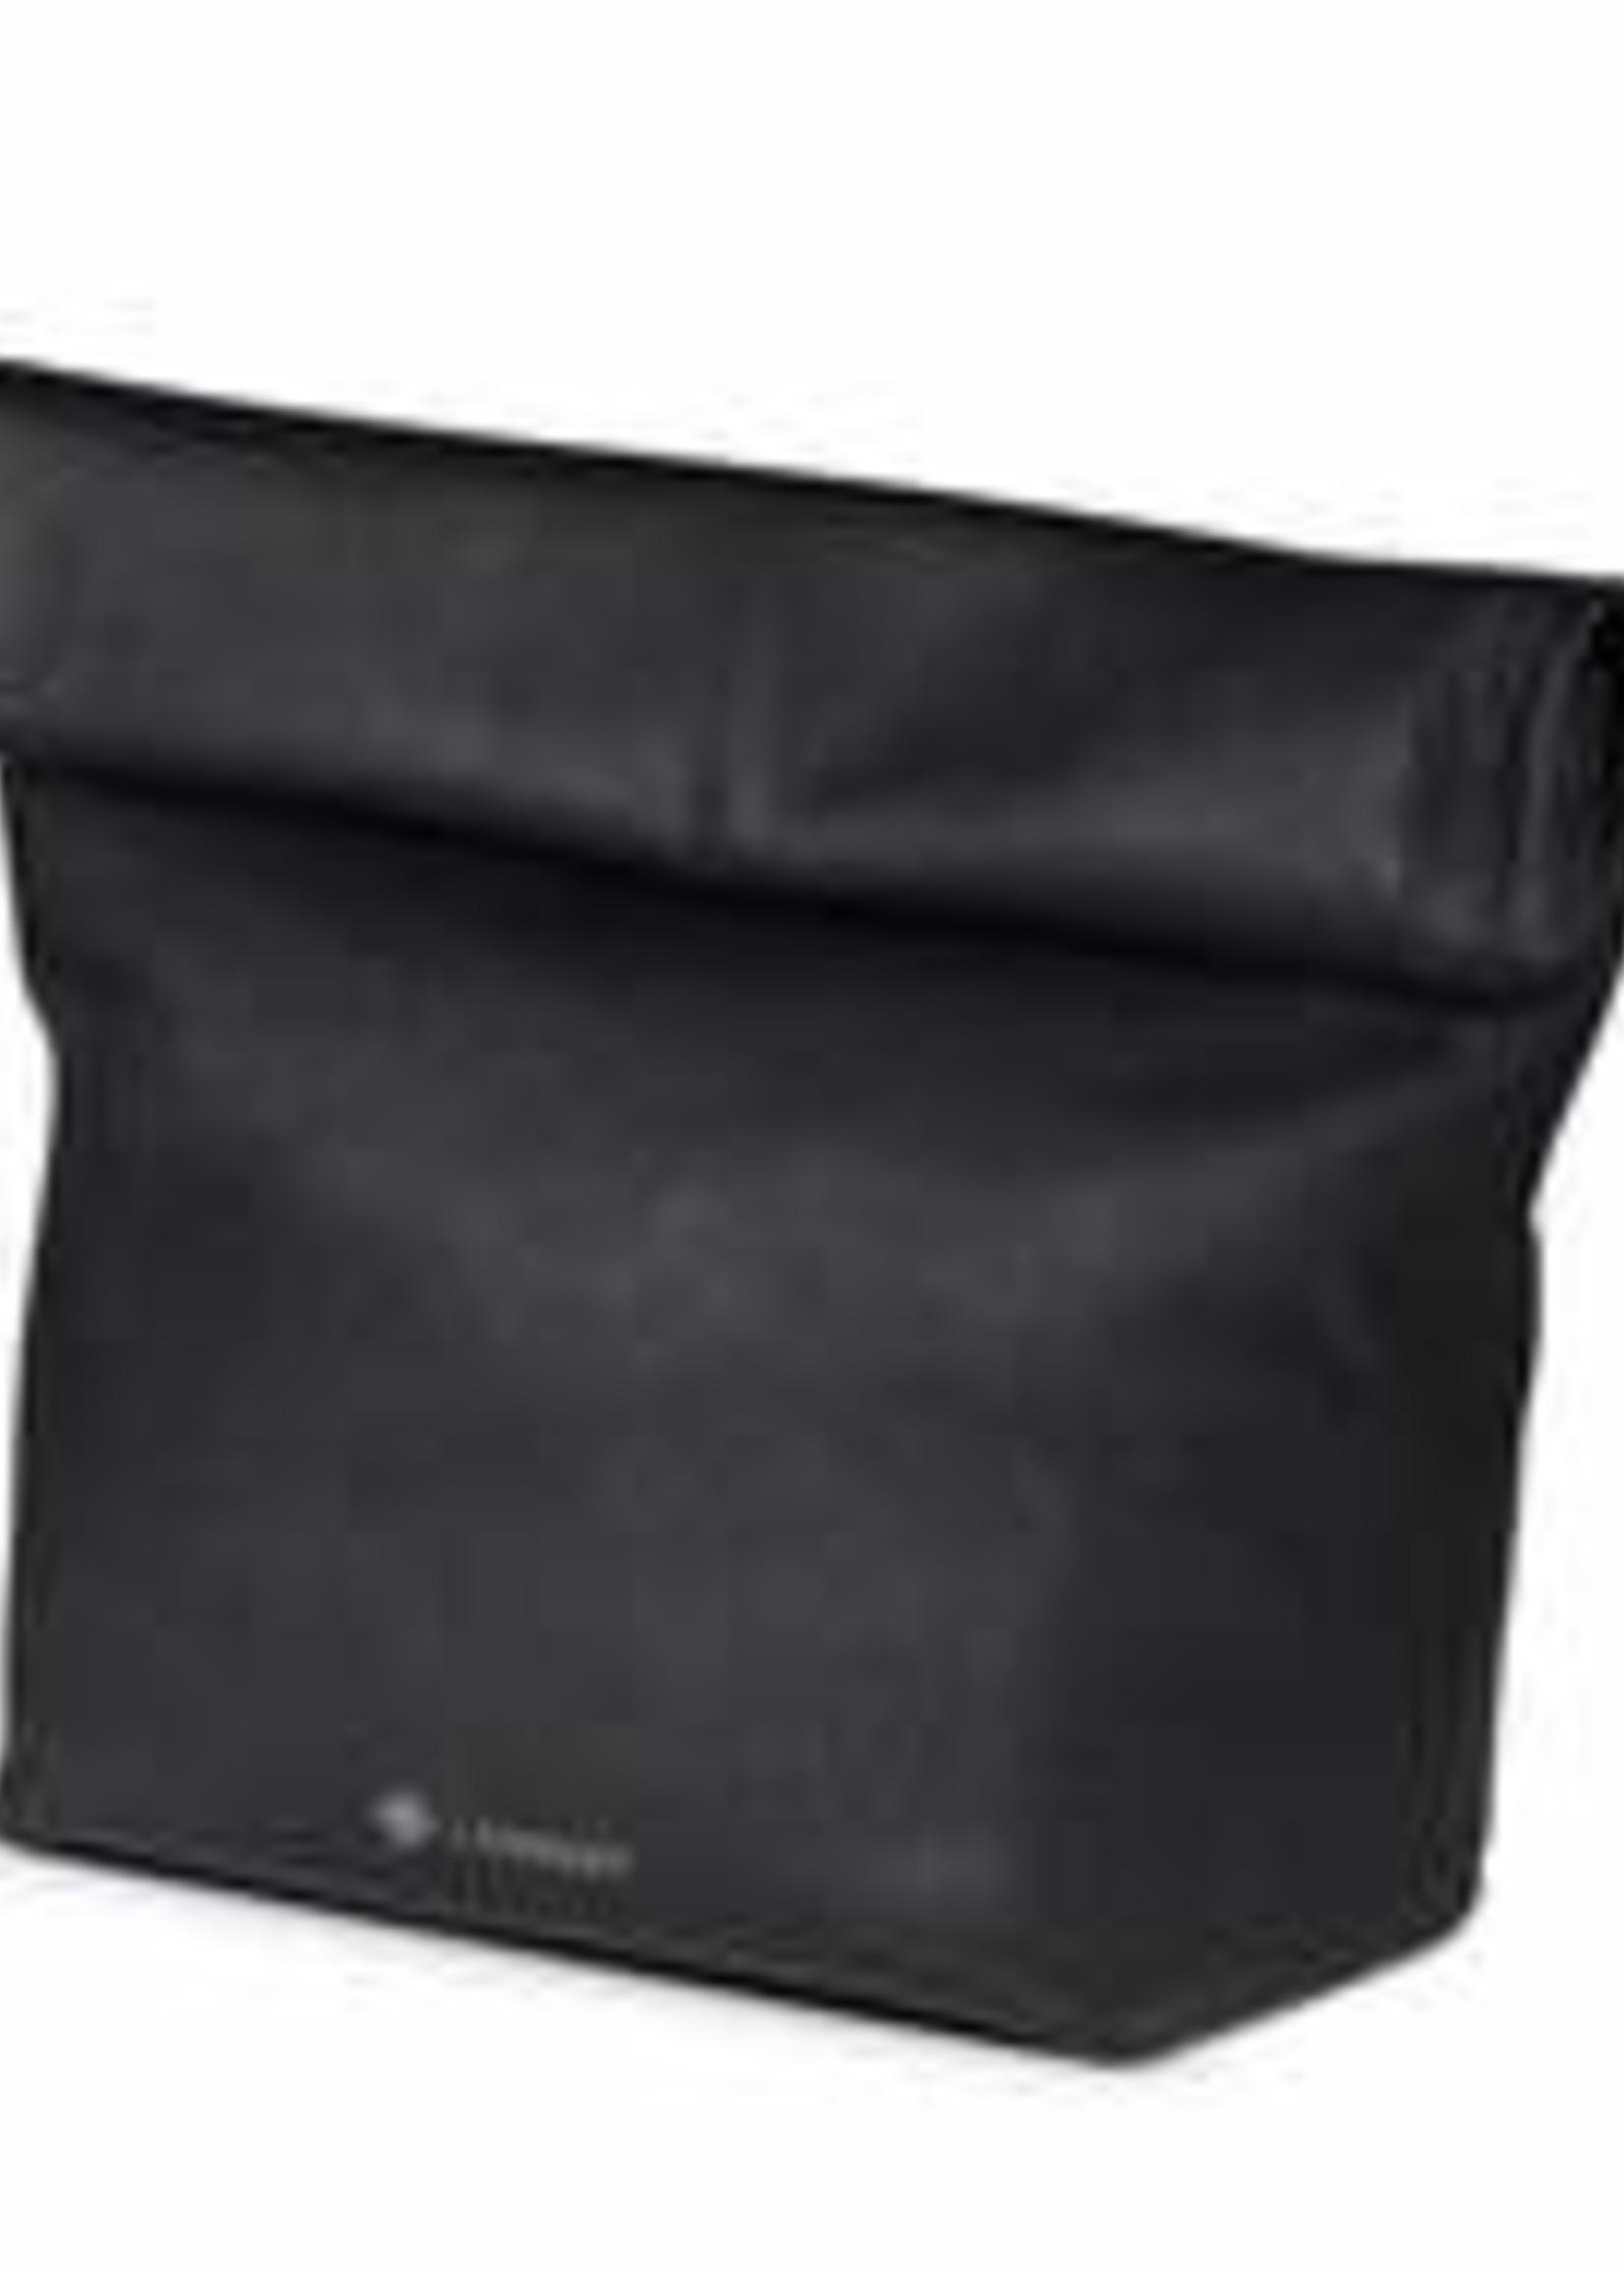 Lambert The KATE - Vegan Leather Unisex Lunch Bag